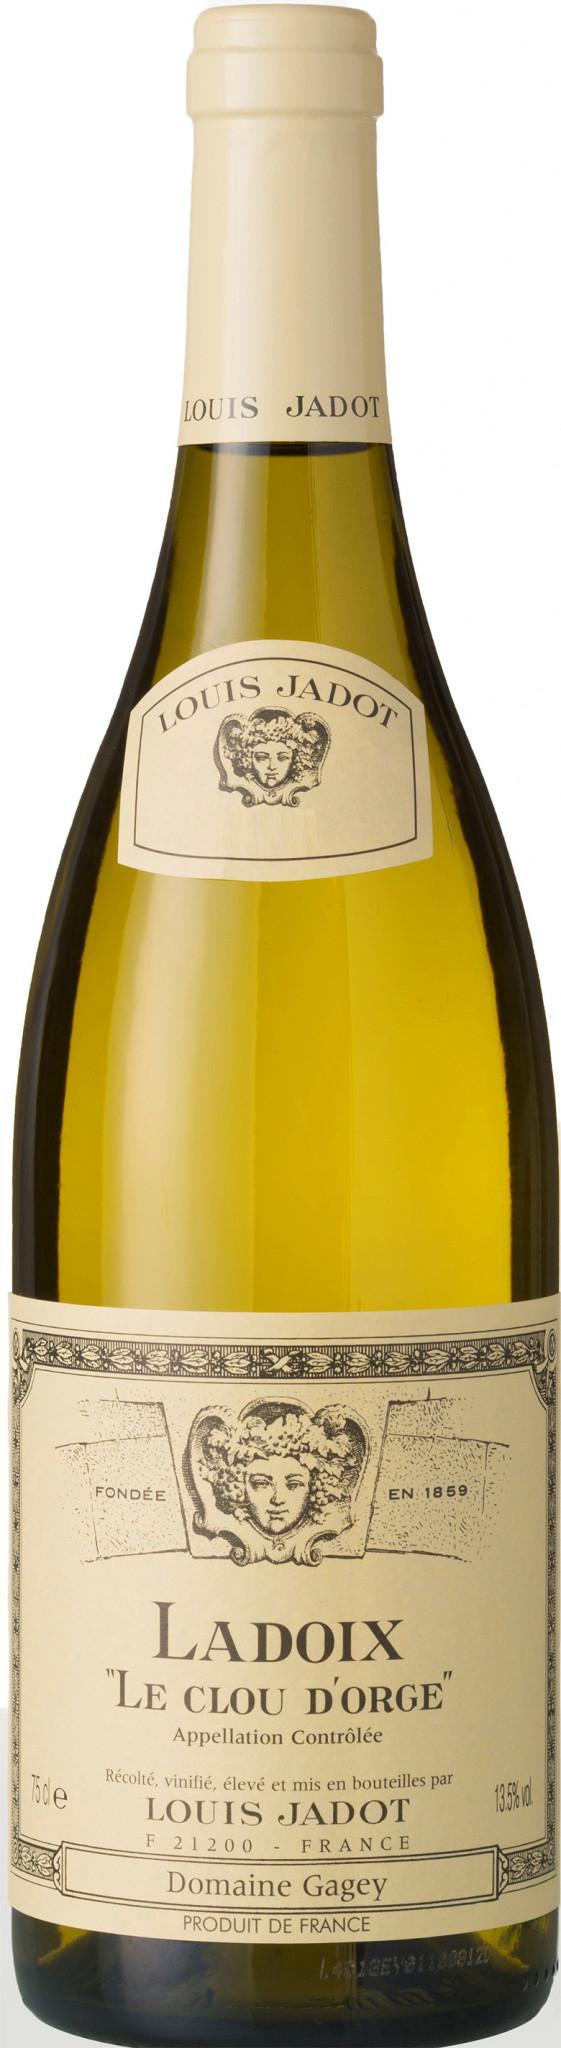 Louis Jadot Ladoix -wineaffair